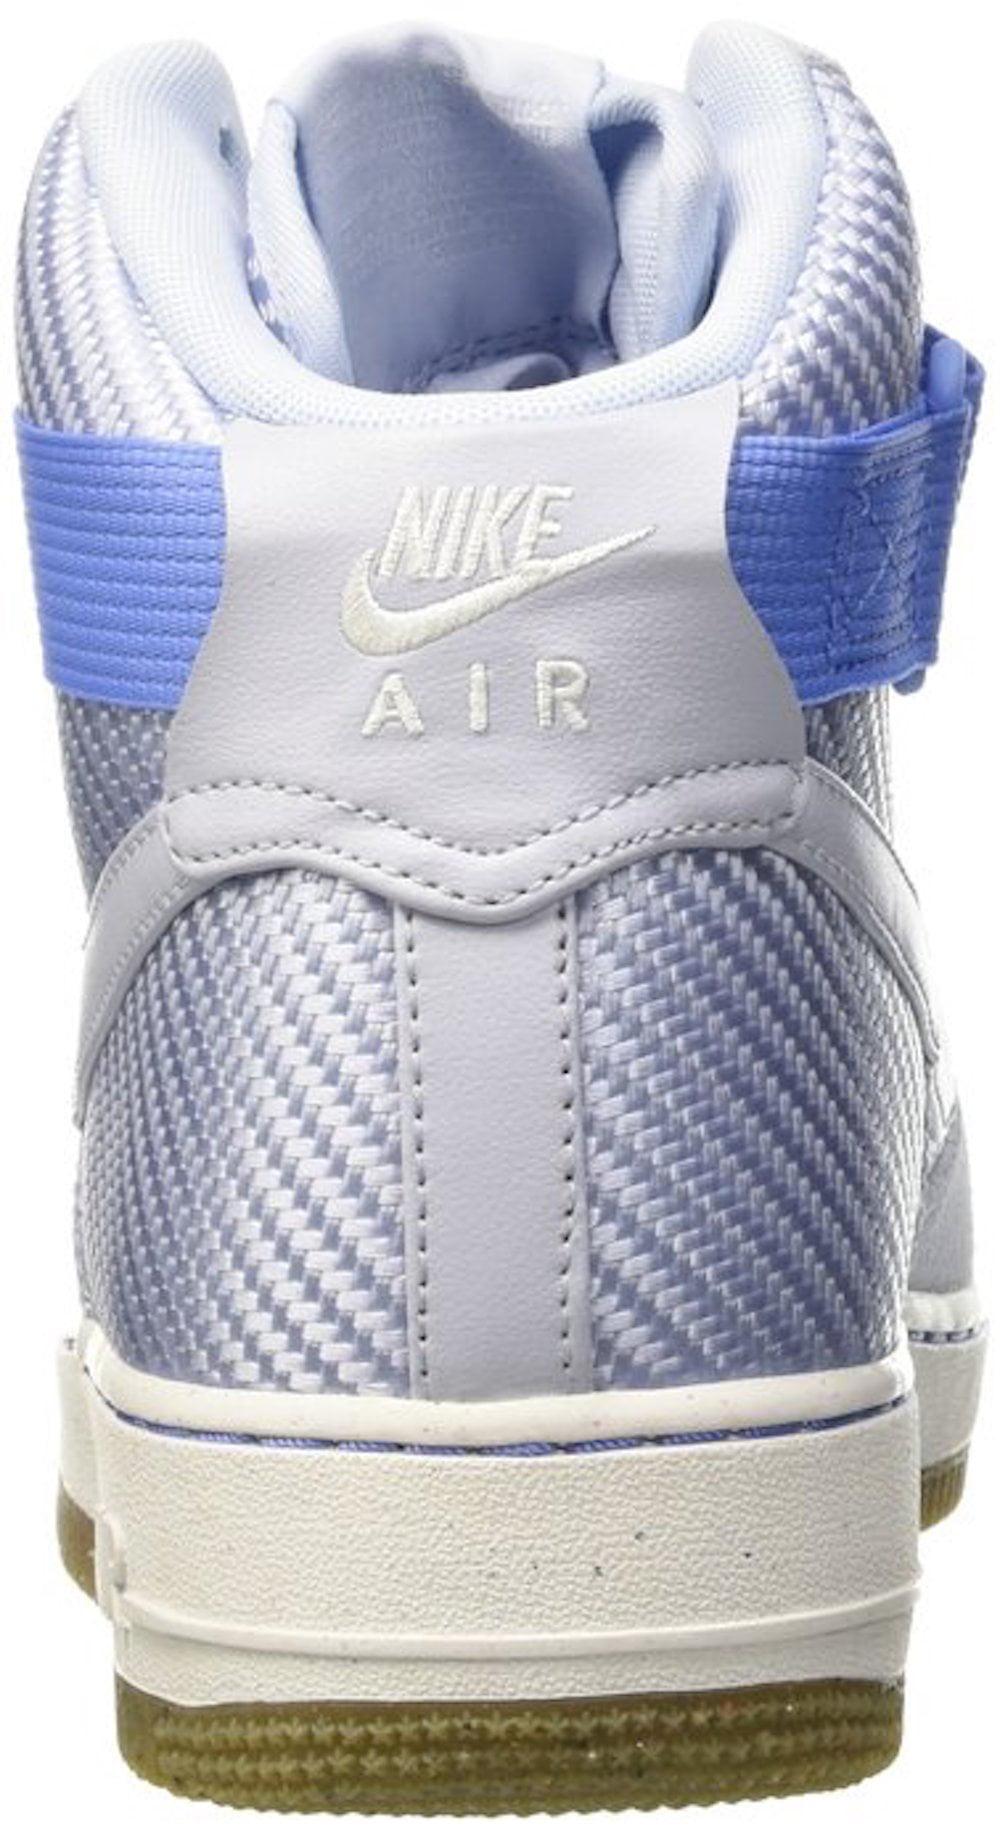 ca8dda0f6264 Nike - nike 654440-401  women s air force 1 hi prm porpoise basketball shoe  (porpoise porpoise